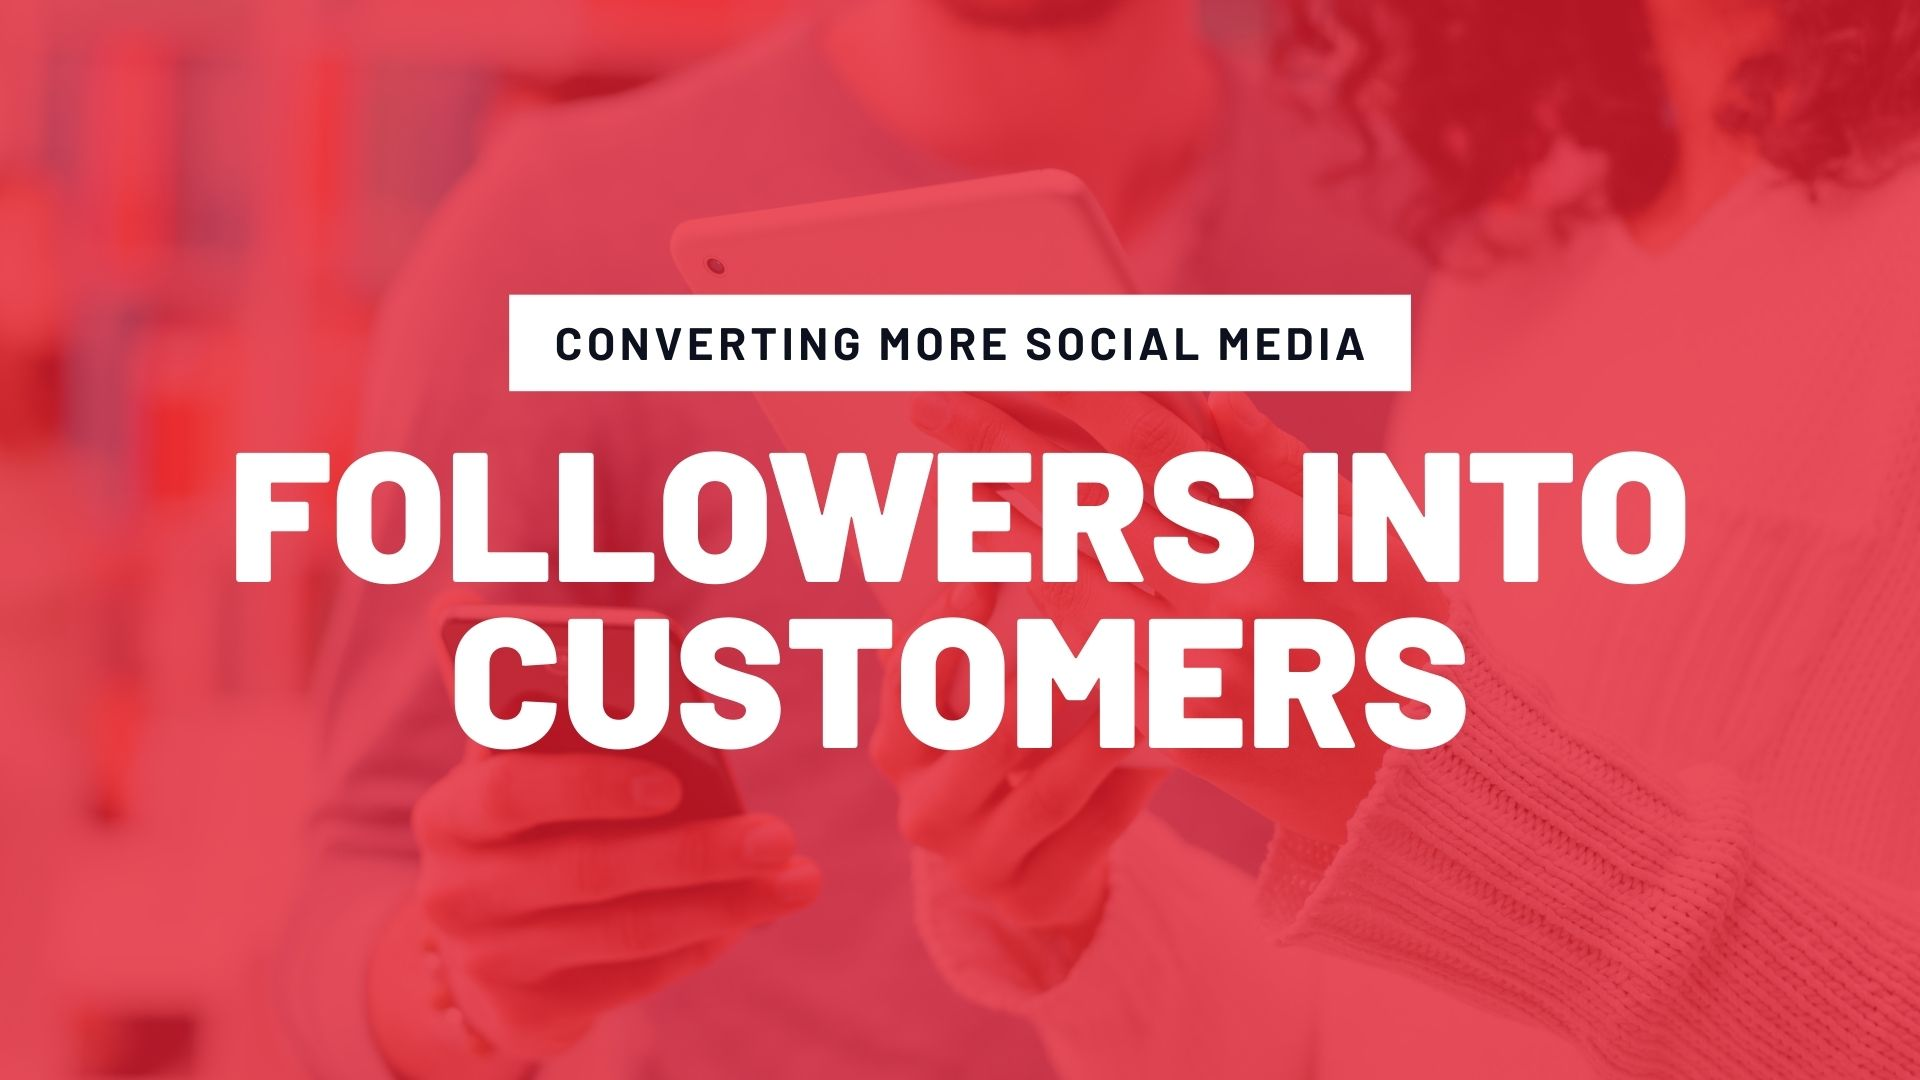 followers into customers, social media, social media strategy, social media business strategy, social media ecommerce, social commerce, converting customers with social media, social media small business tips, social media ecommerce tips, social commerce 2021